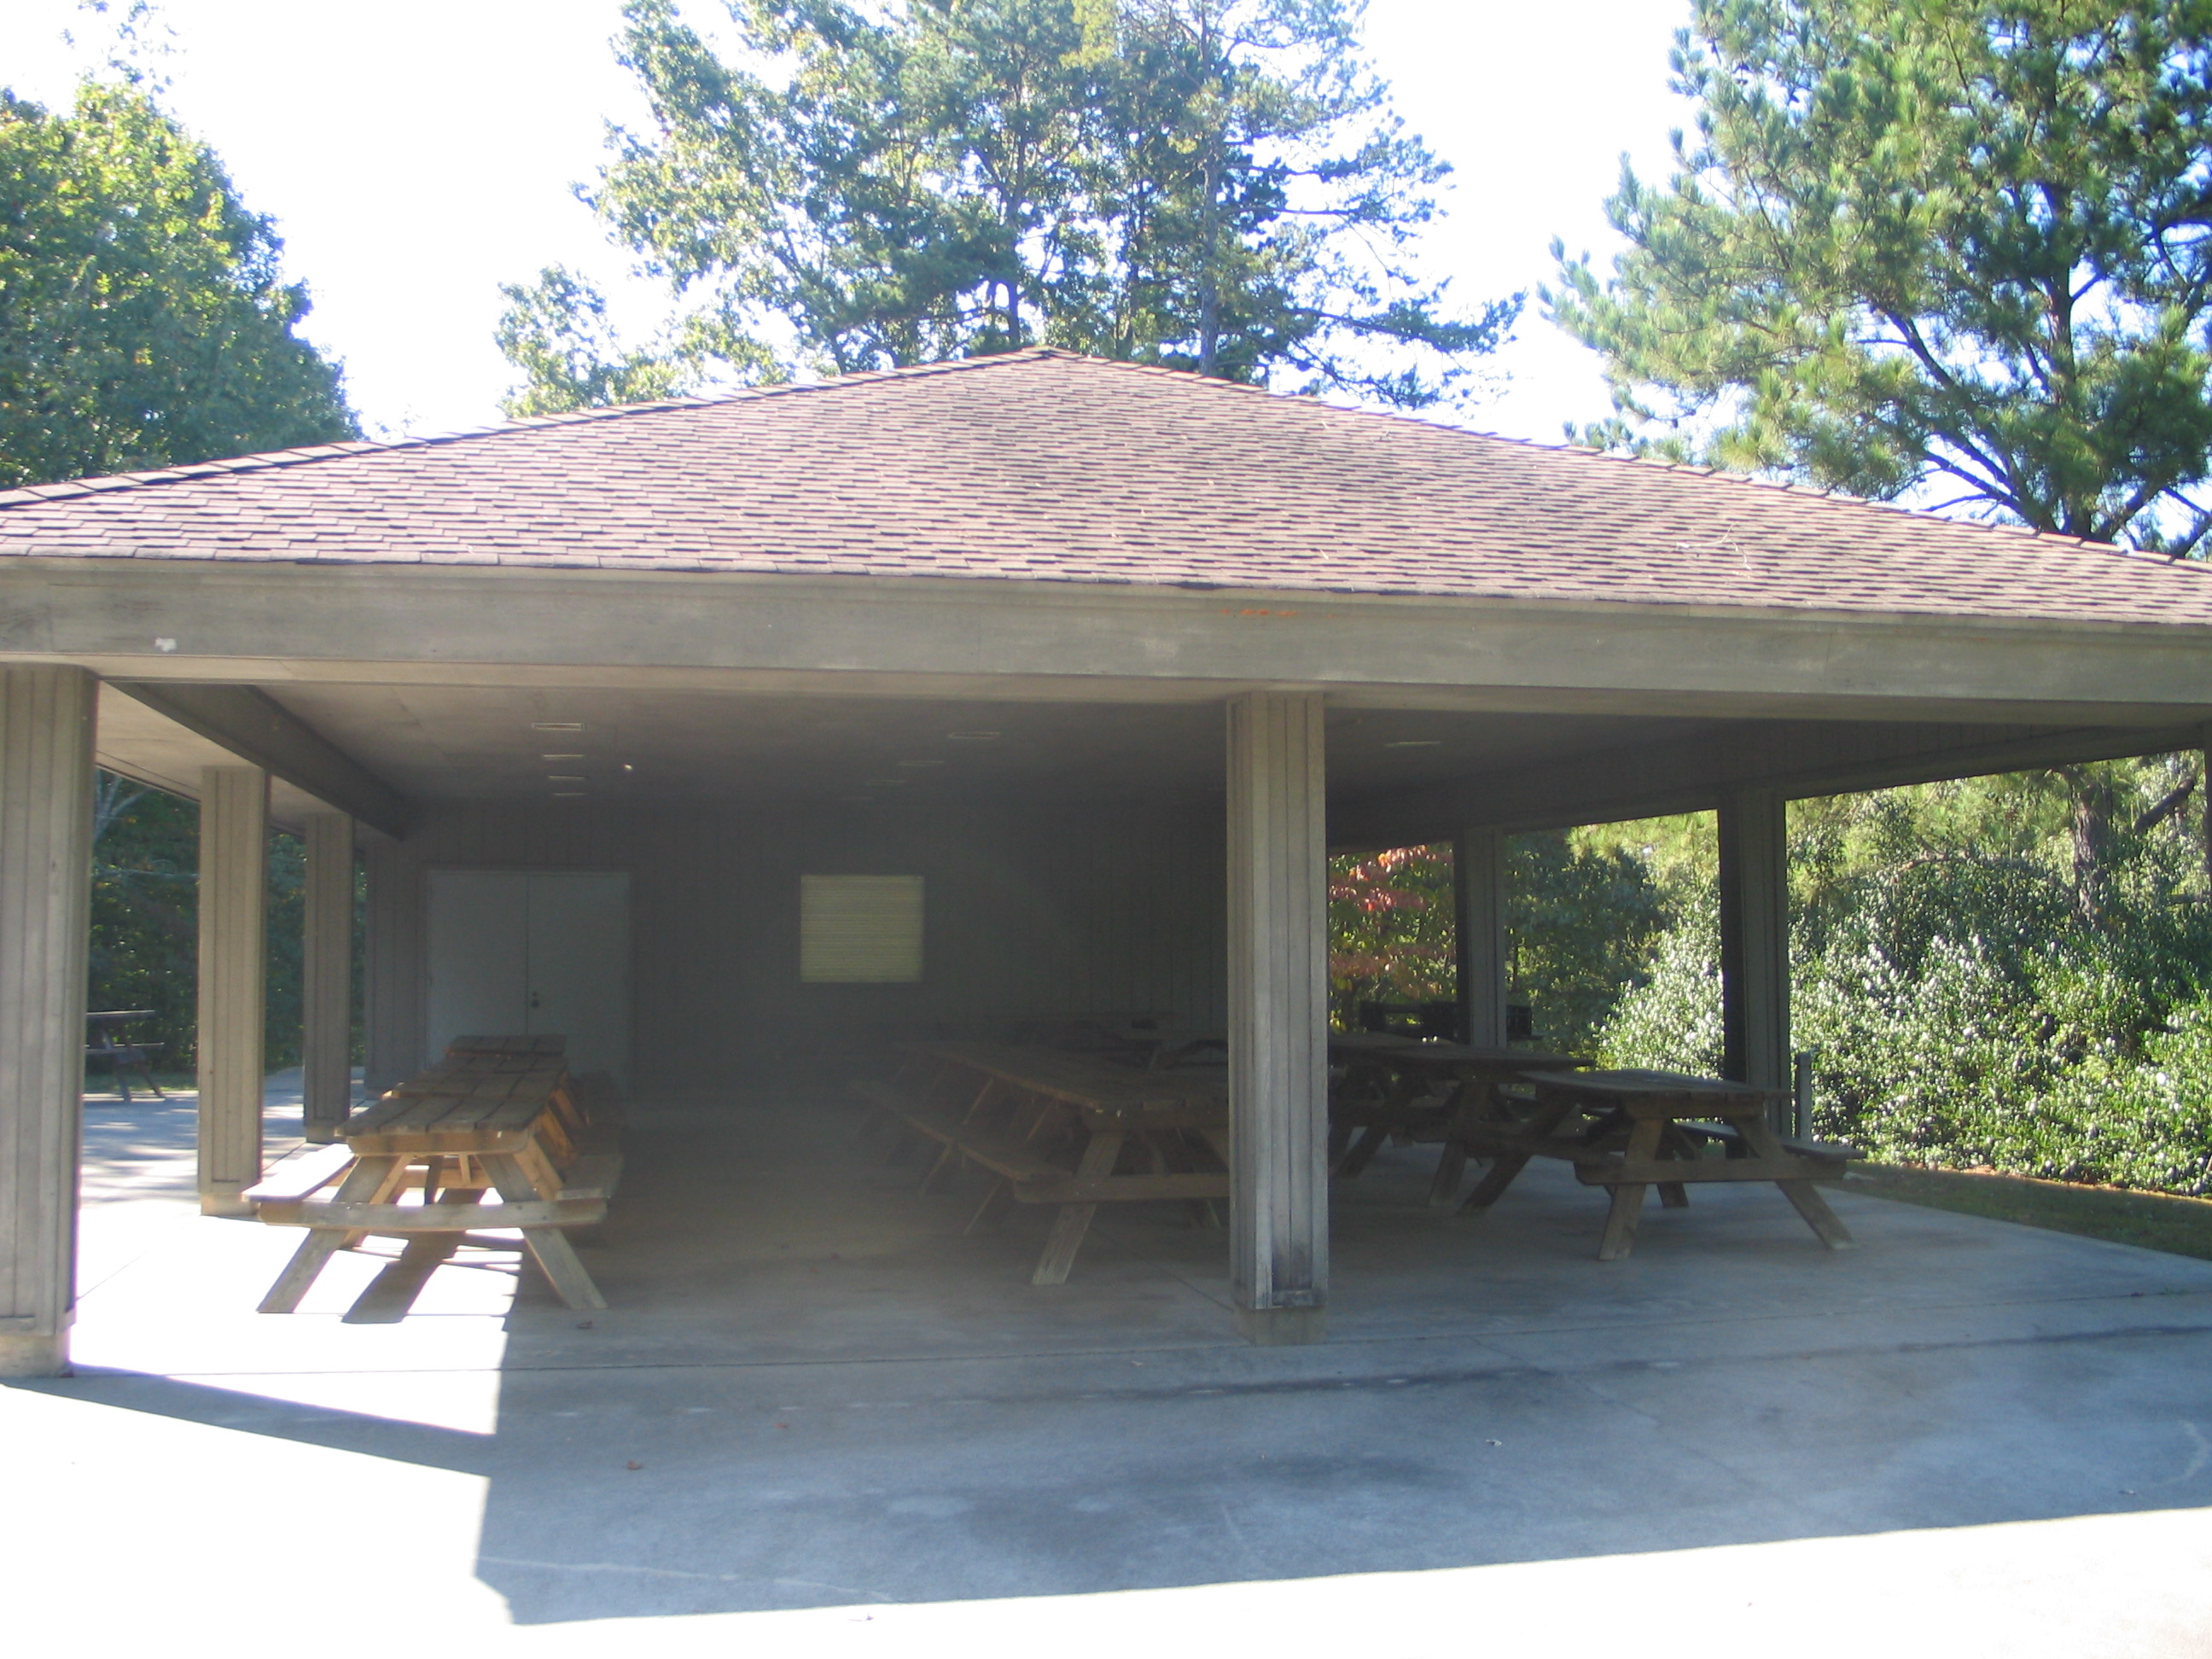 Picnic shelters at lake hartwell state park for Picnic gazebo